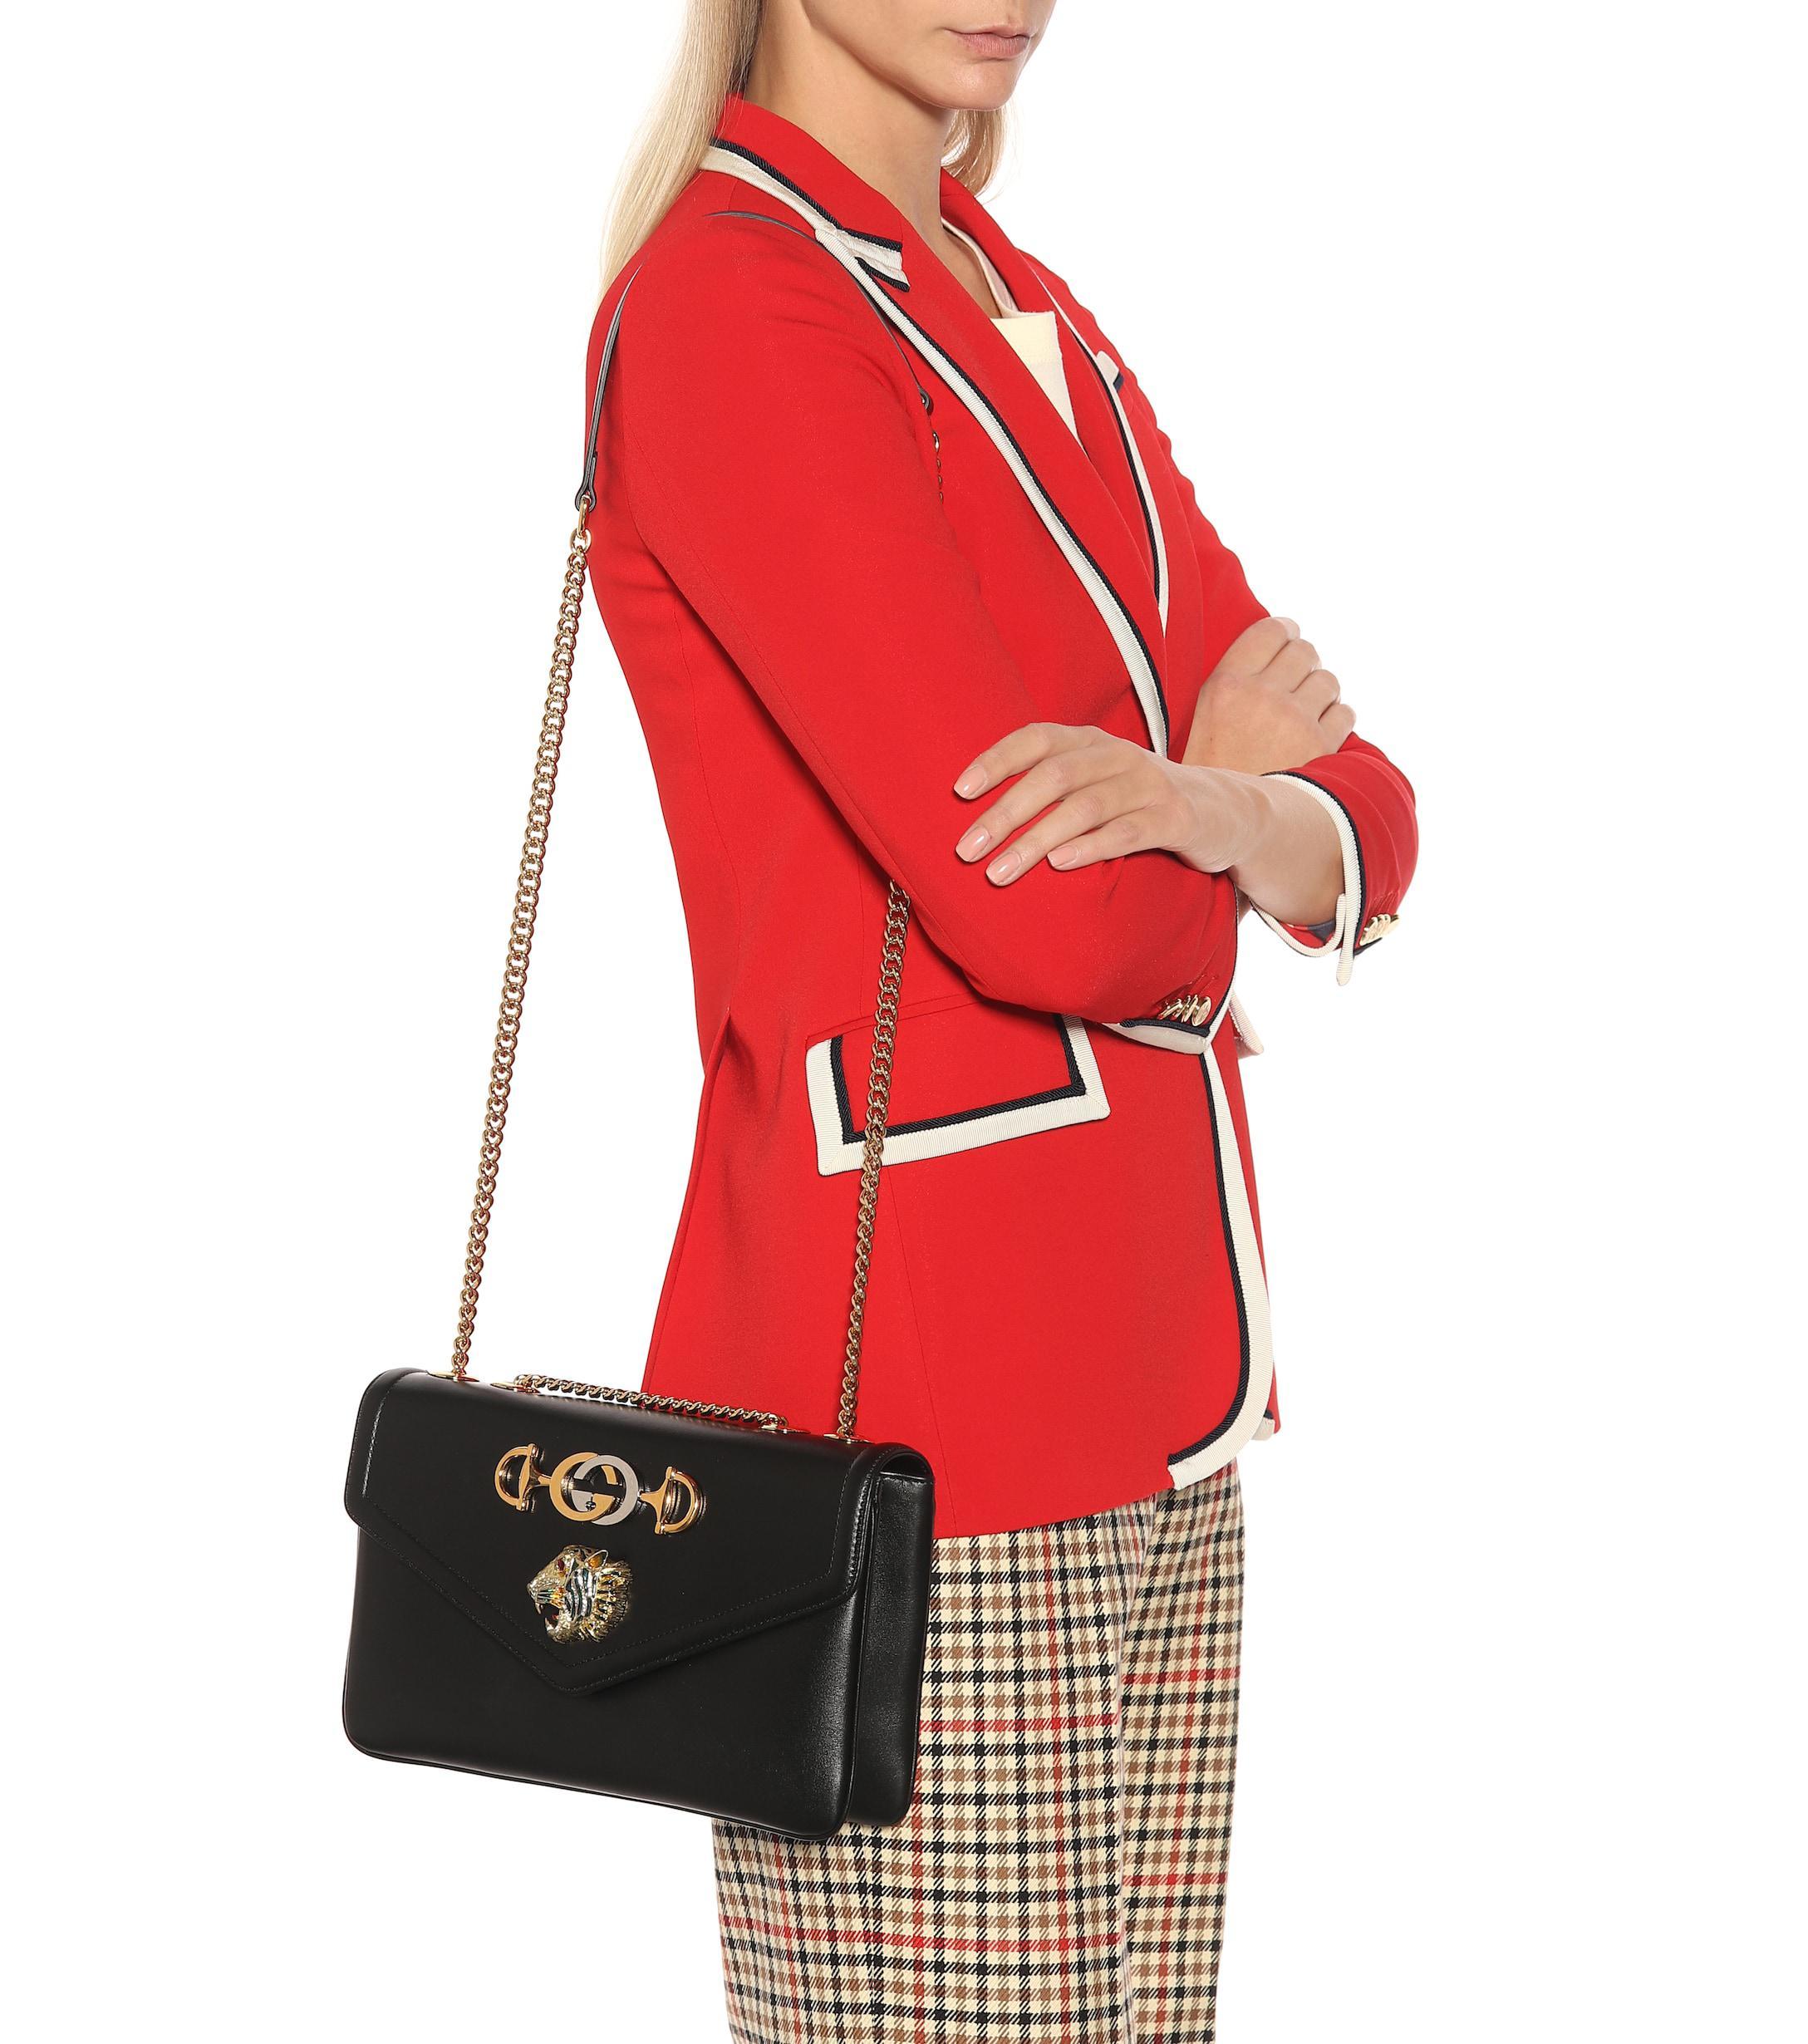 d052b7f40424 Lyst - Gucci Rajah Medium Shoulder Bag in Black - Save 13%